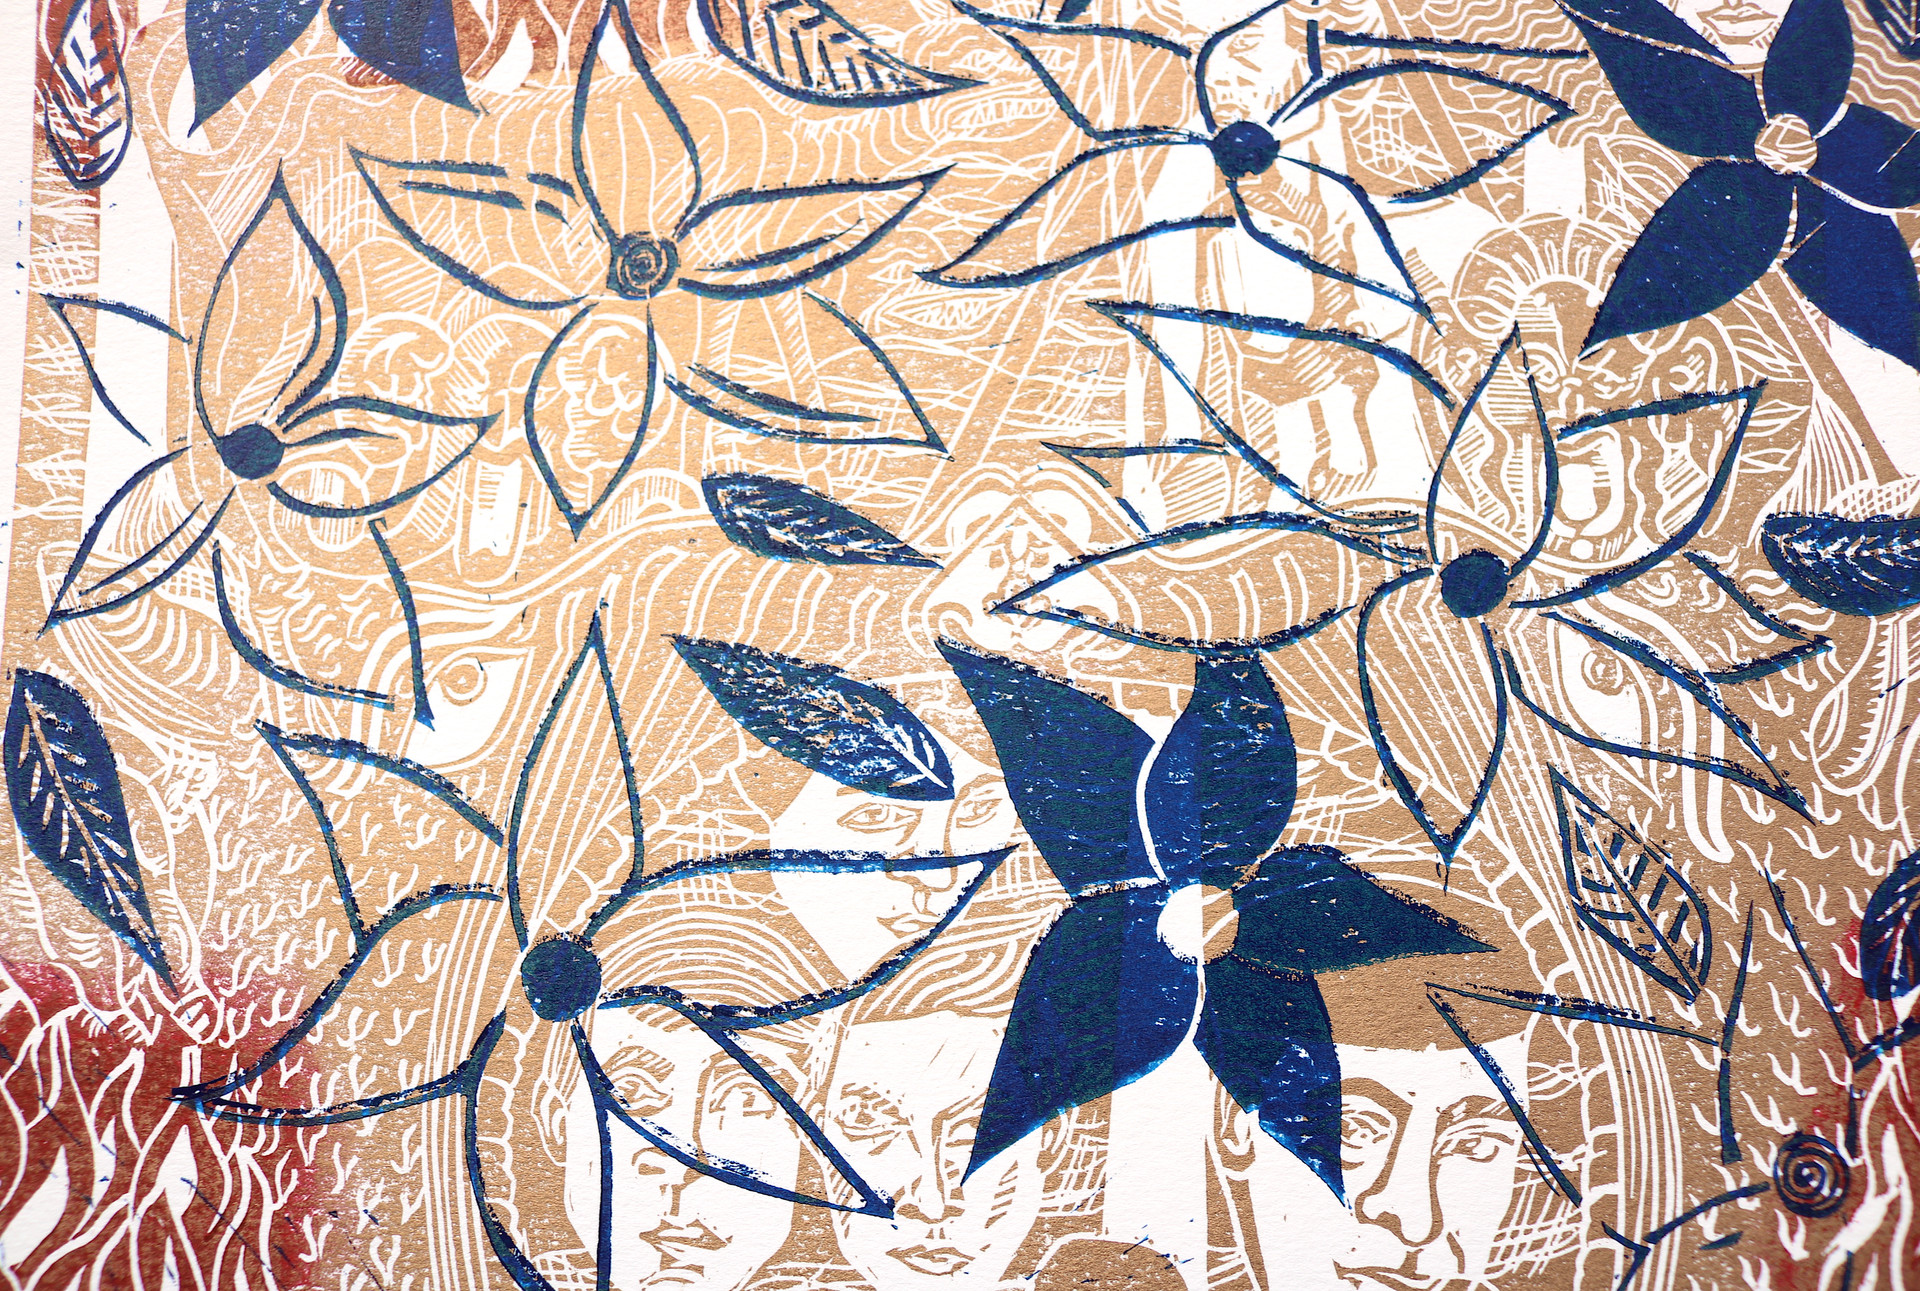 Moatzart original linocut prints r.JPG